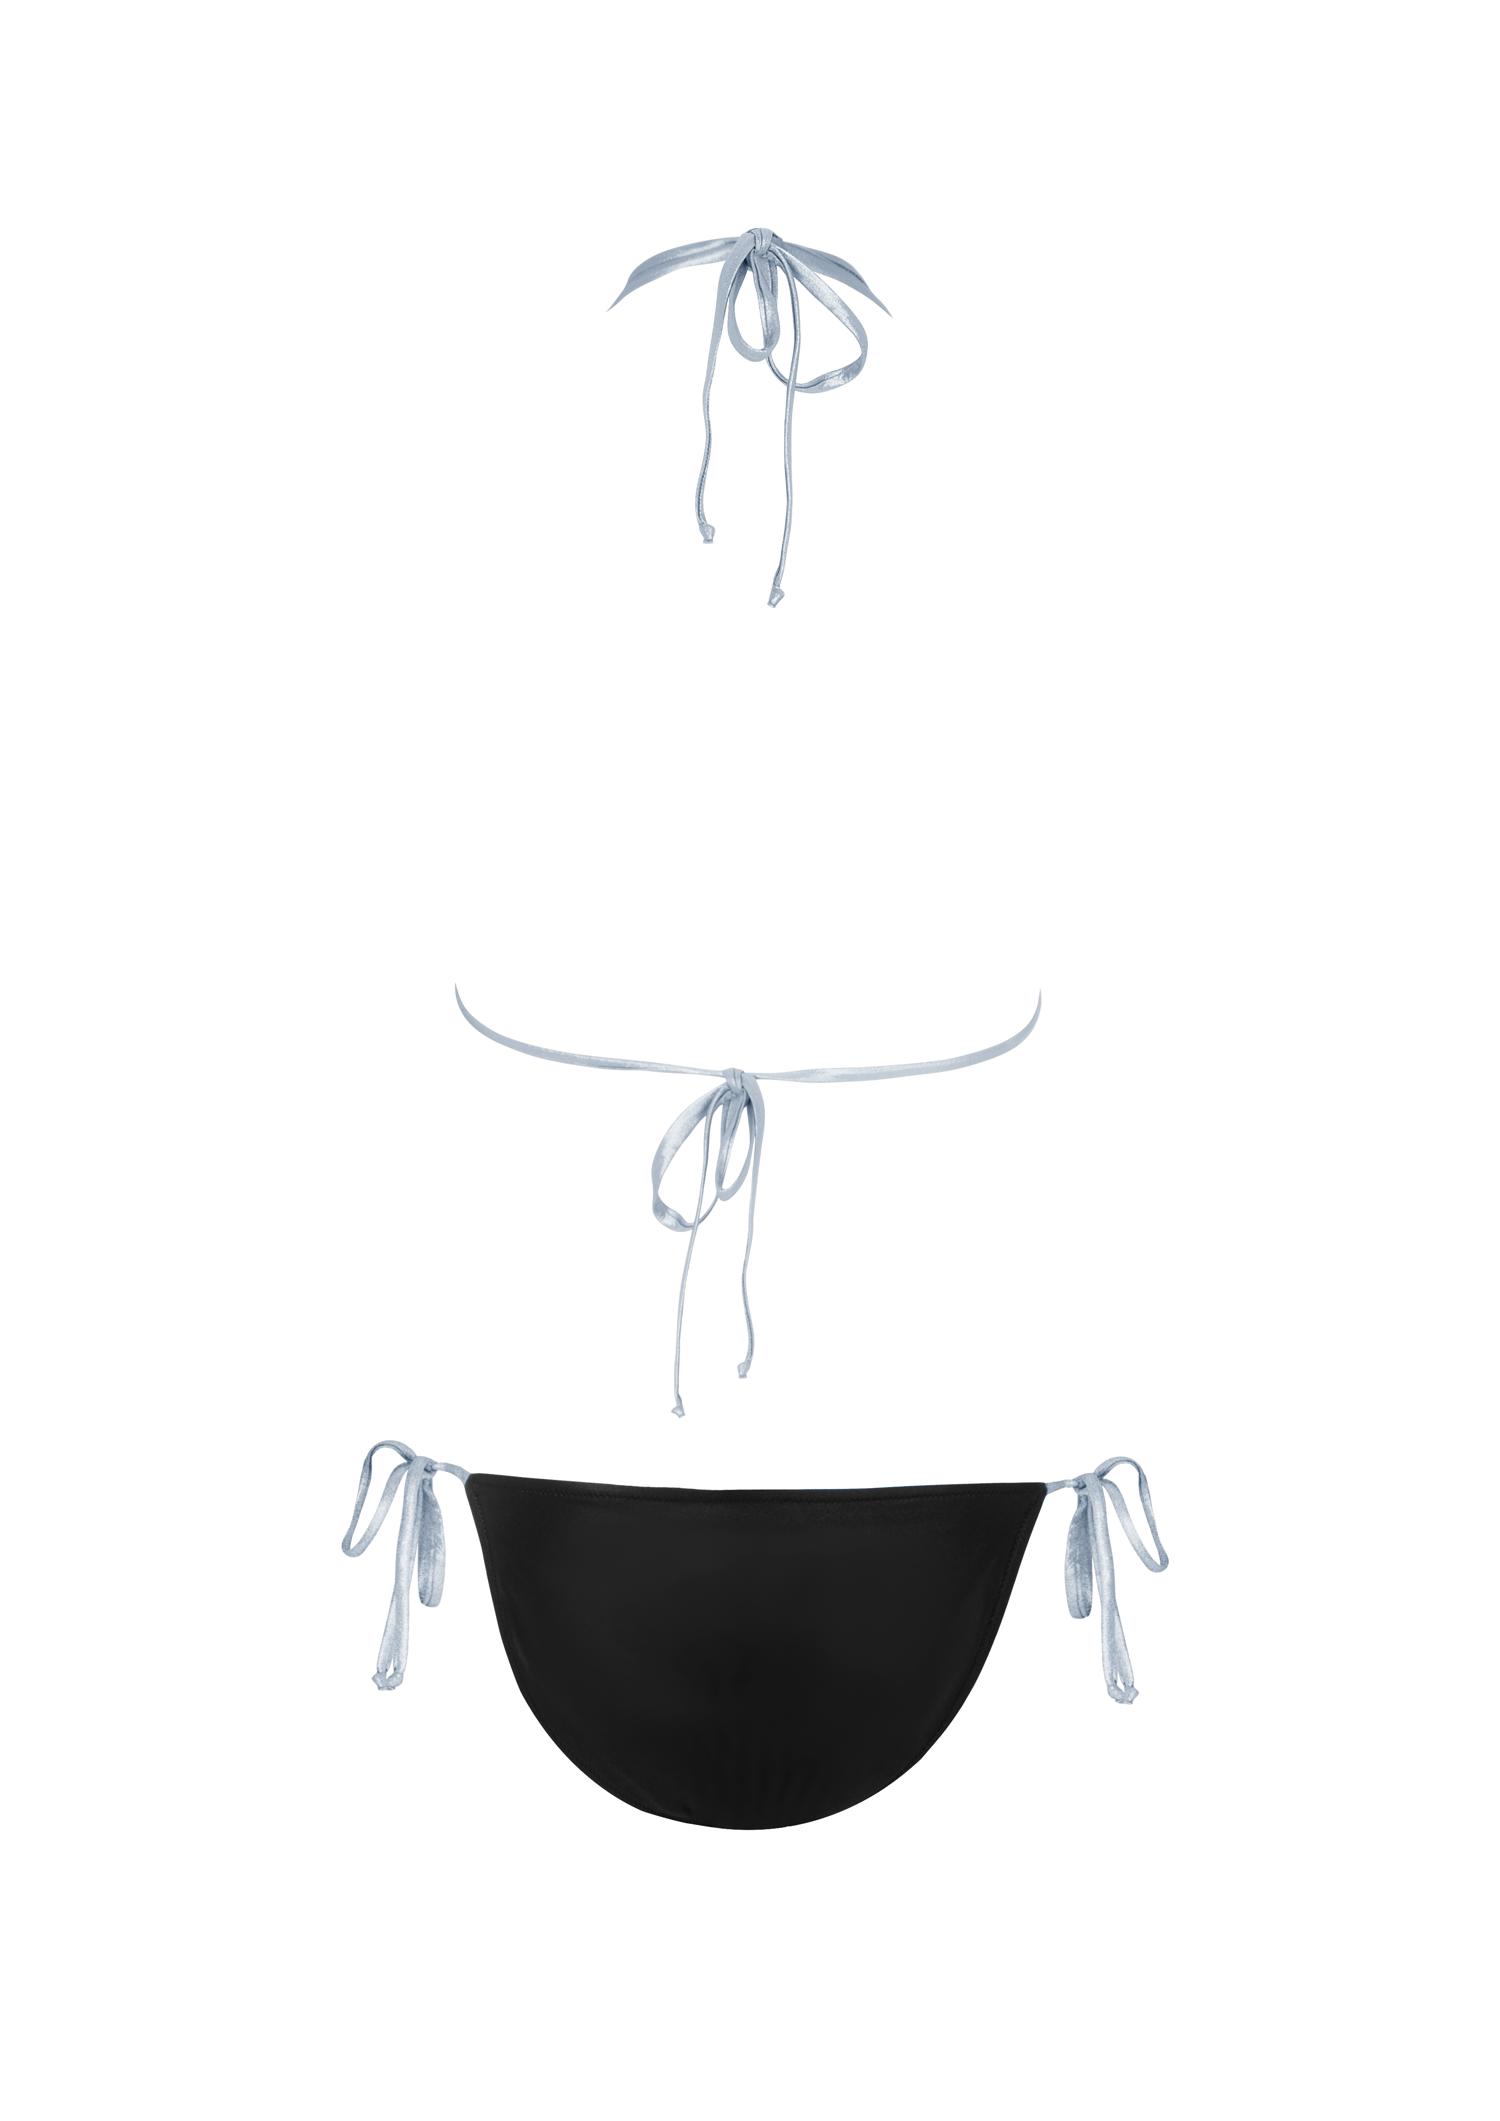 Teeny bikini